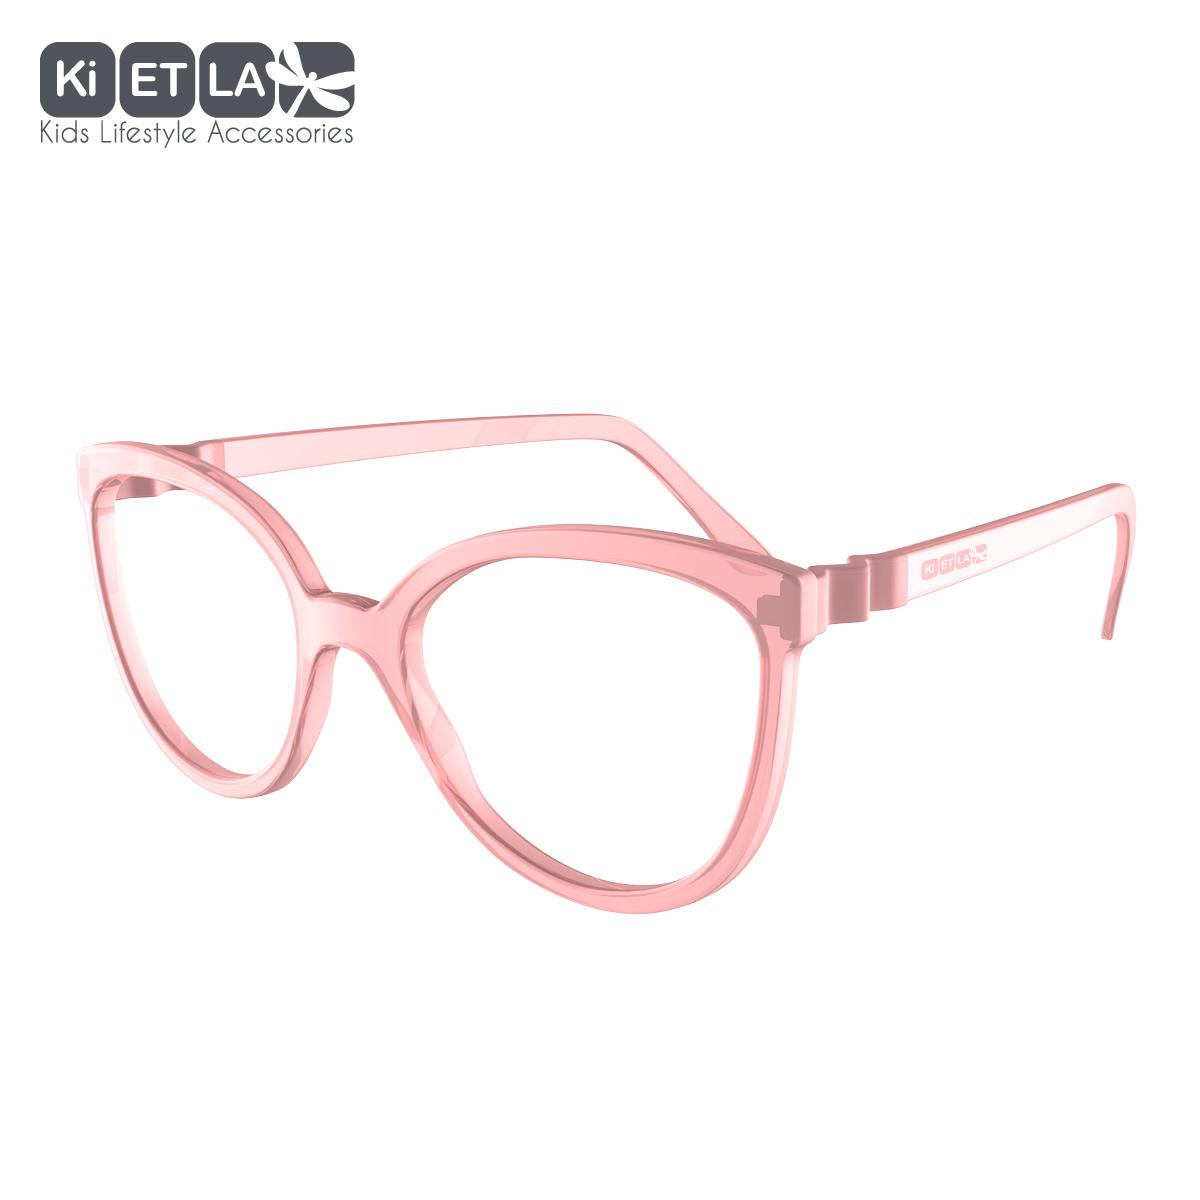 Ki ET LA CraZyg-Zag SCREEN Glasses